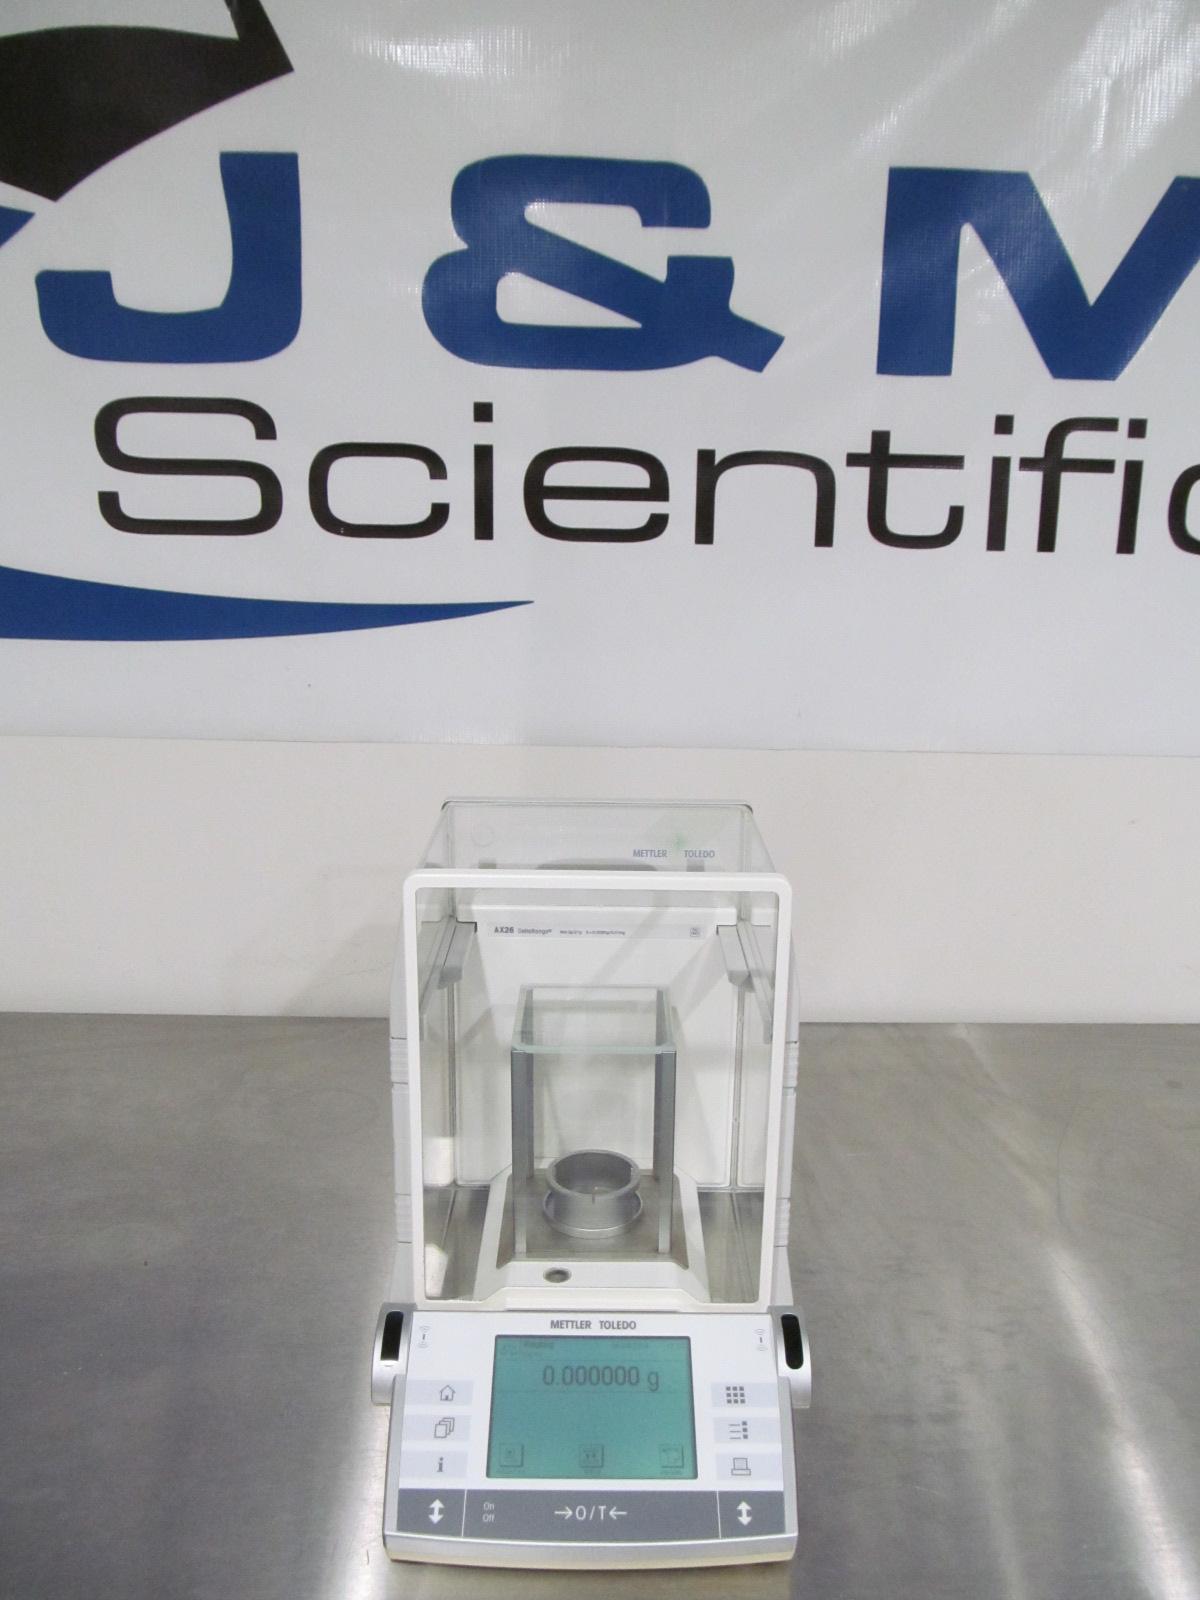 Mettler AX26 Delta Range Micro Balance 0.002mg / 21mg - 3g / 21g